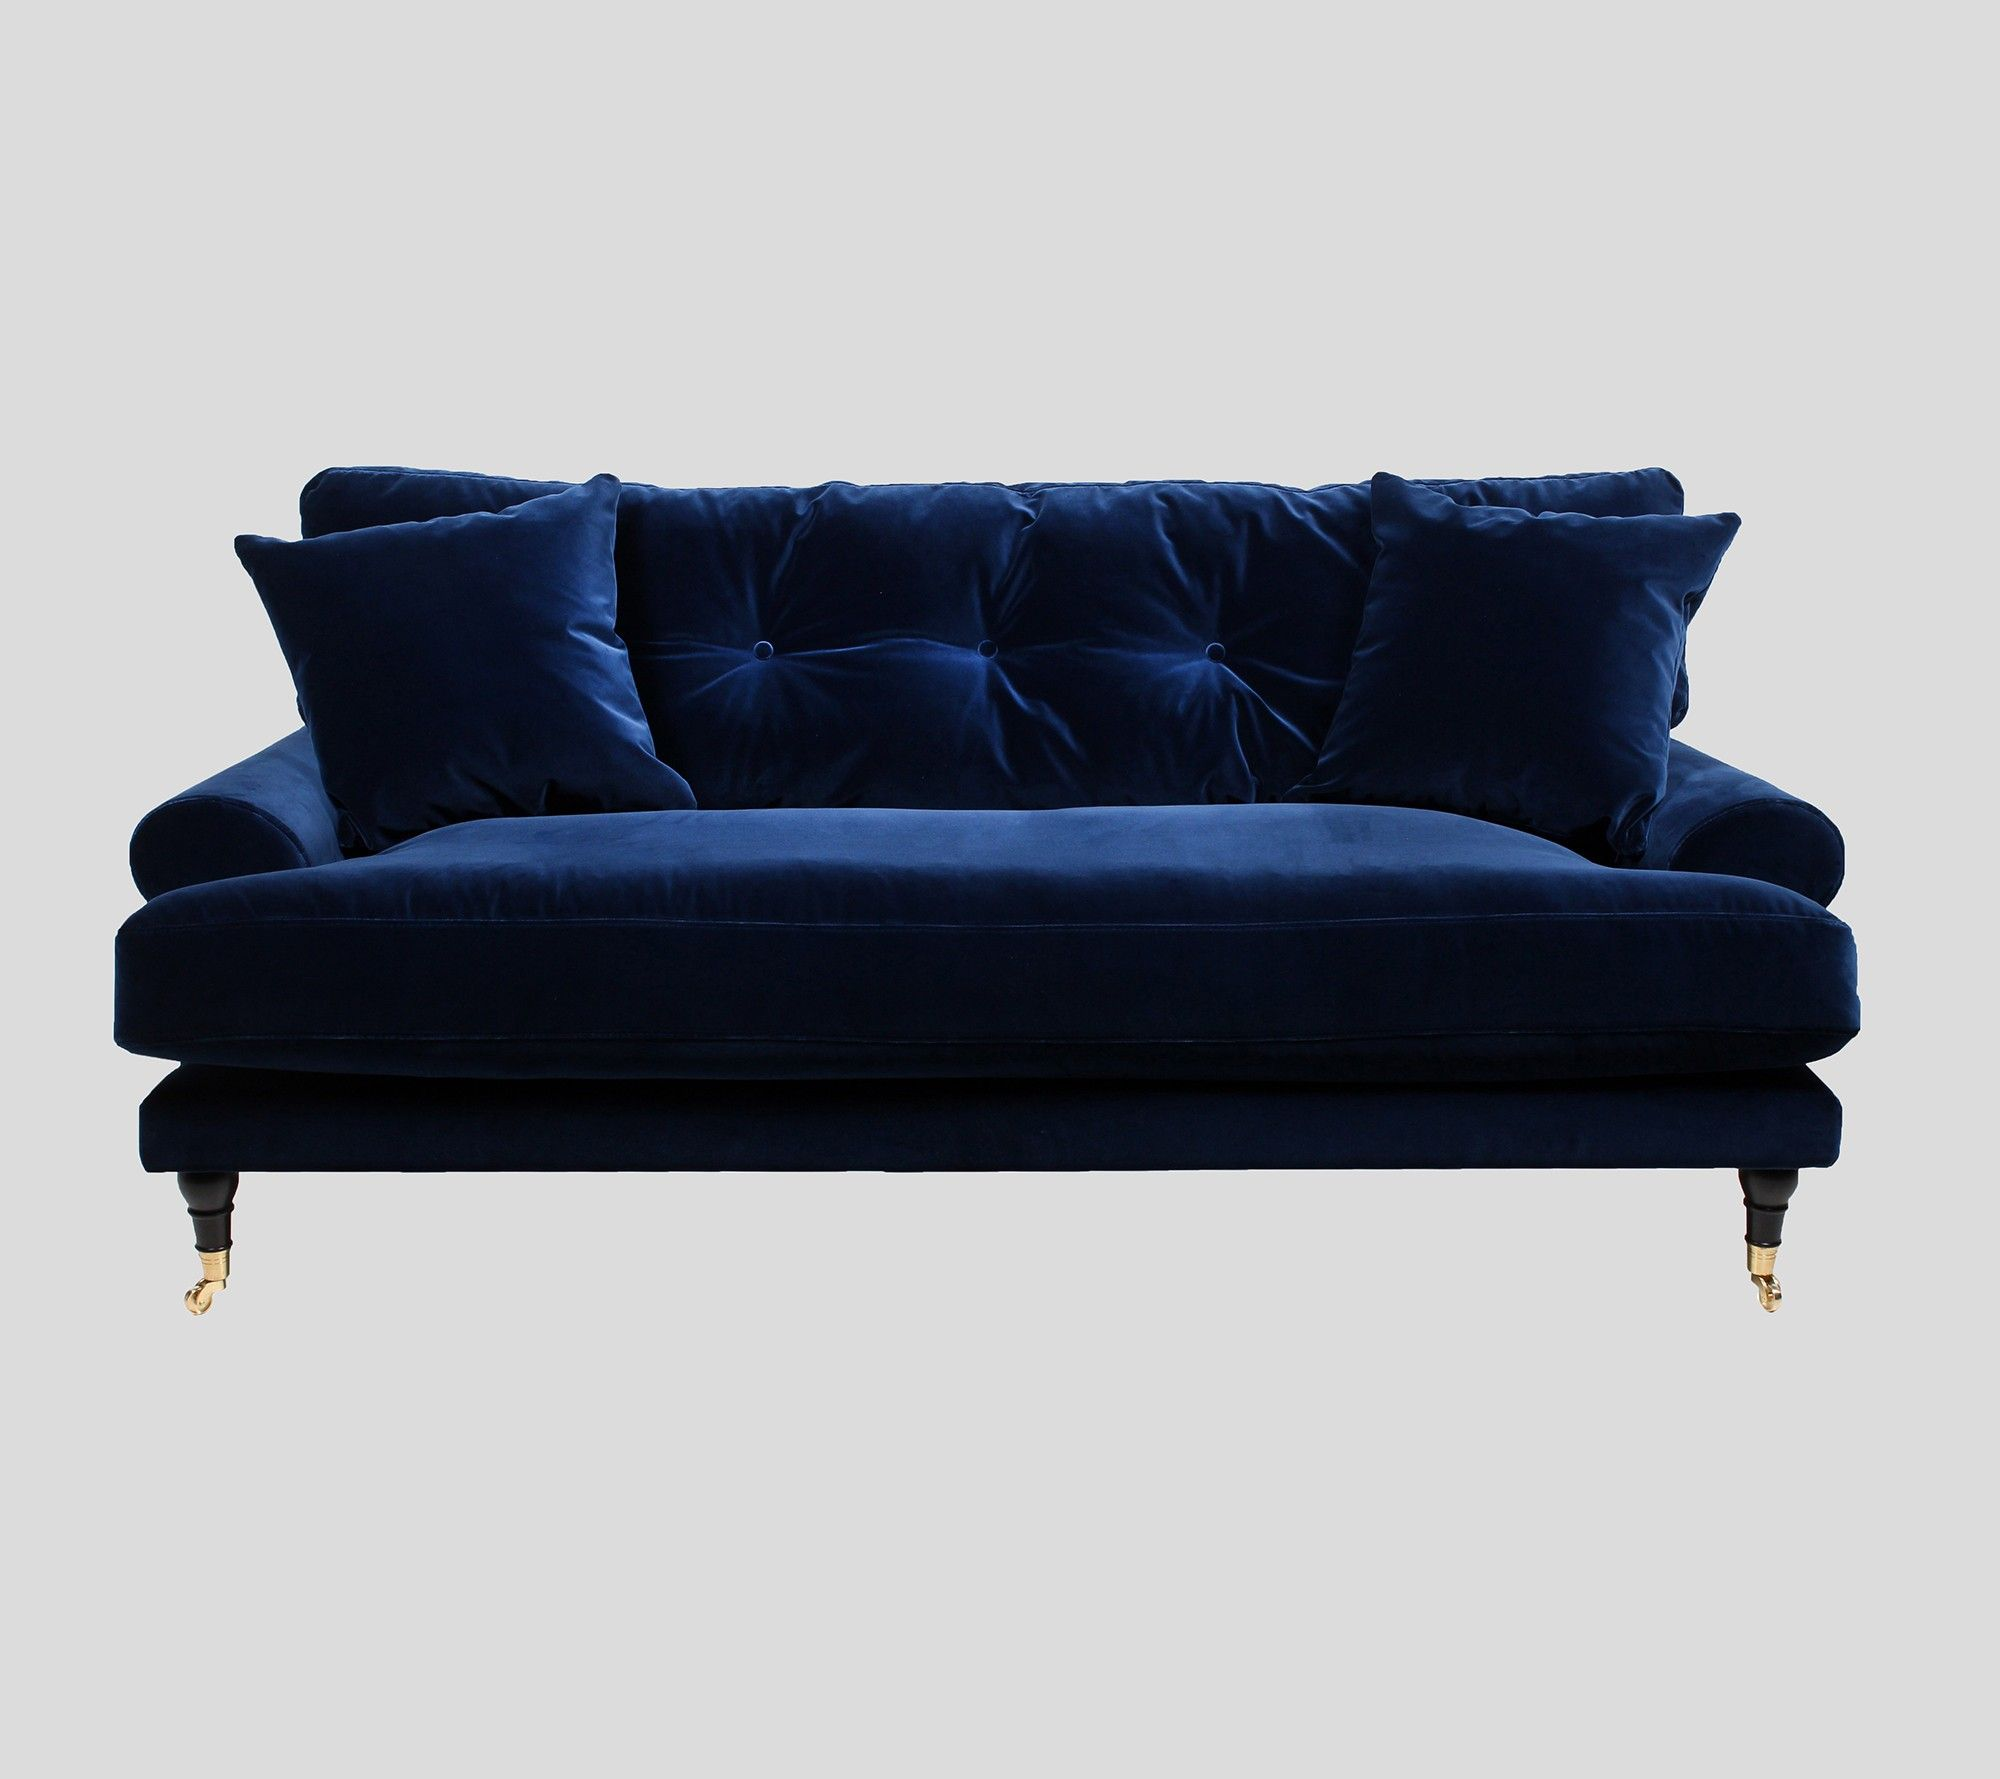 Deep Blue Velvet Sofa In Two Amp Three Seat Sofas Att